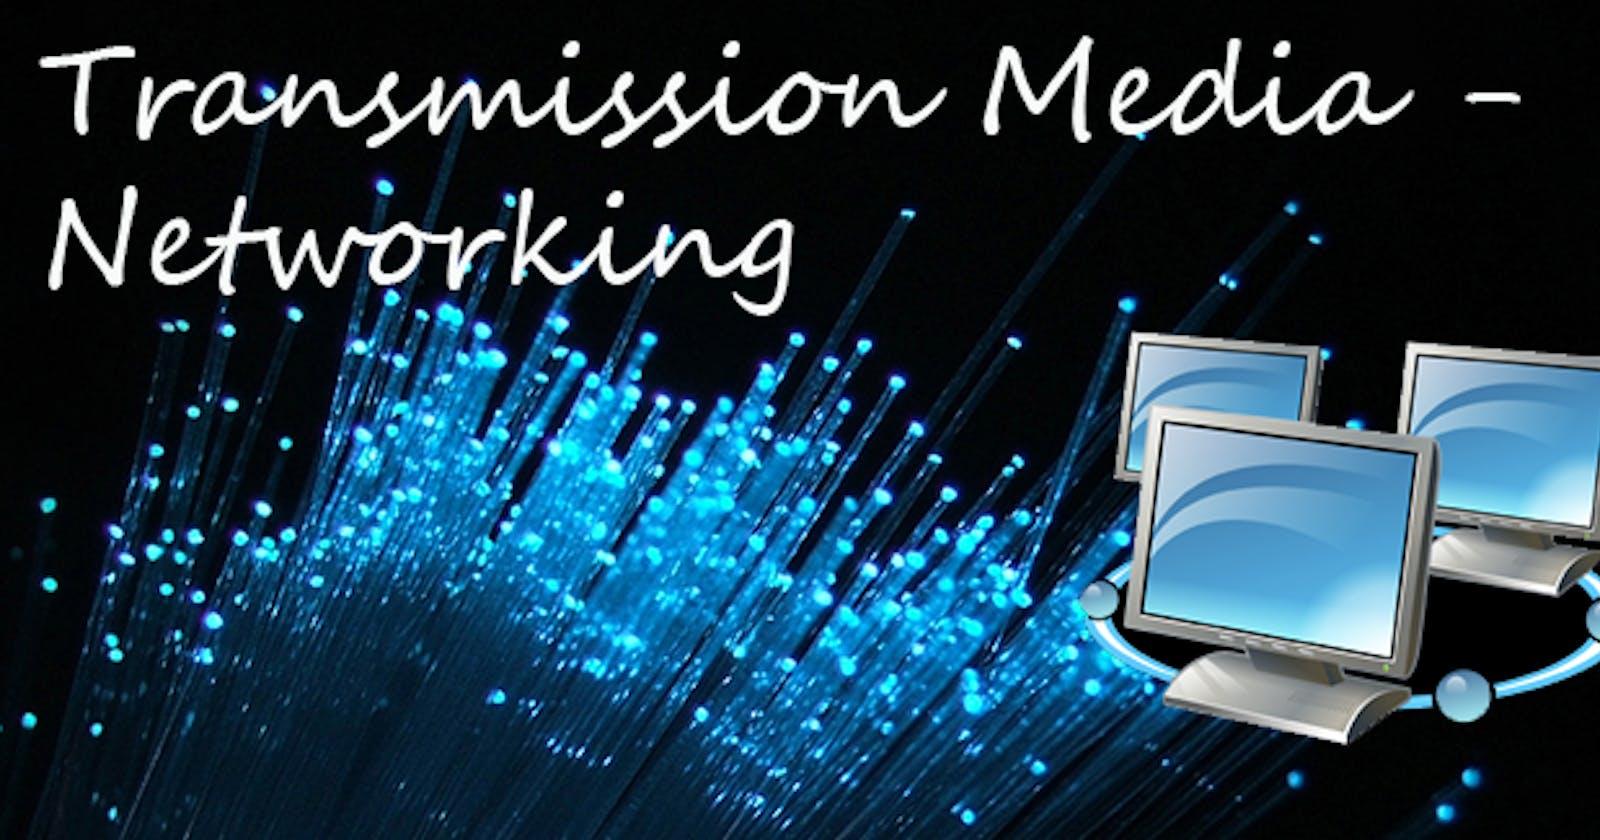 Transmission media in Networks